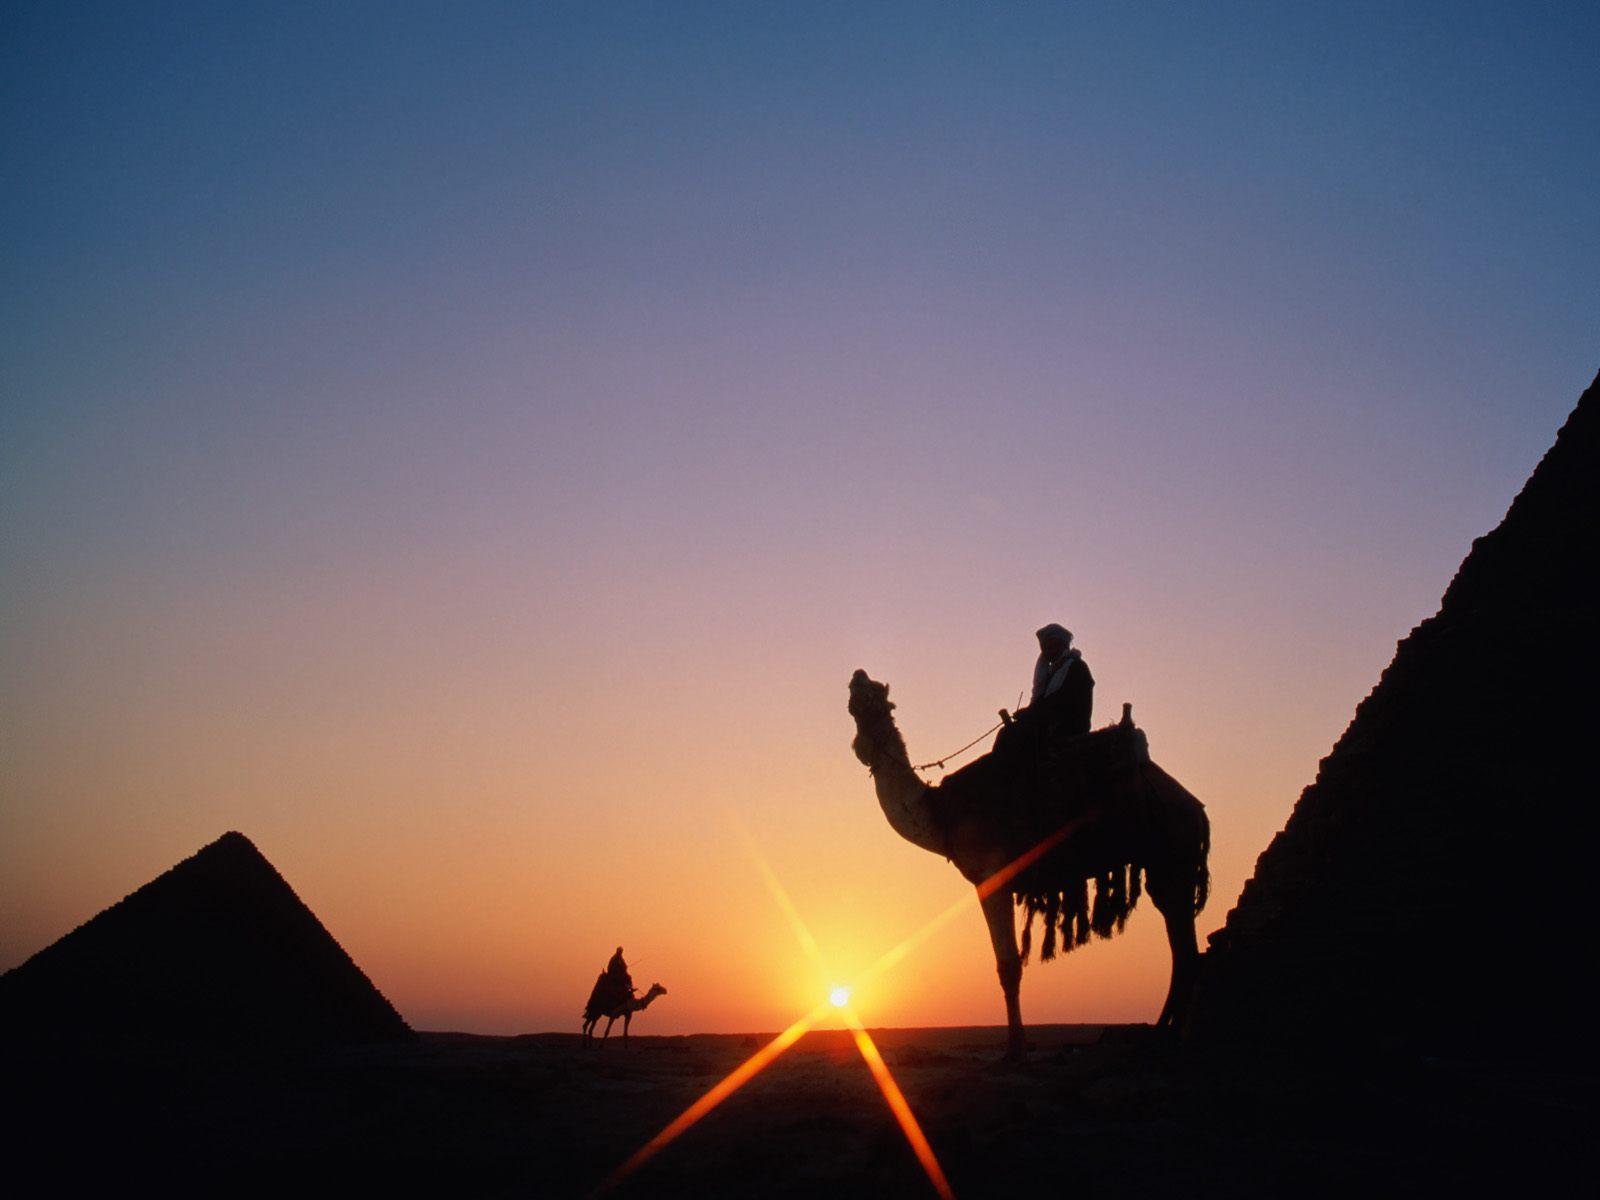 http://3.bp.blogspot.com/_Cw3TduNUQn0/TSvXxgVzc7I/AAAAAAAAAEg/qsfcX5Z-sIk/s1600/Pyramid%2BSunset%252C%2BGiza%252C%2BEgypt.jpg